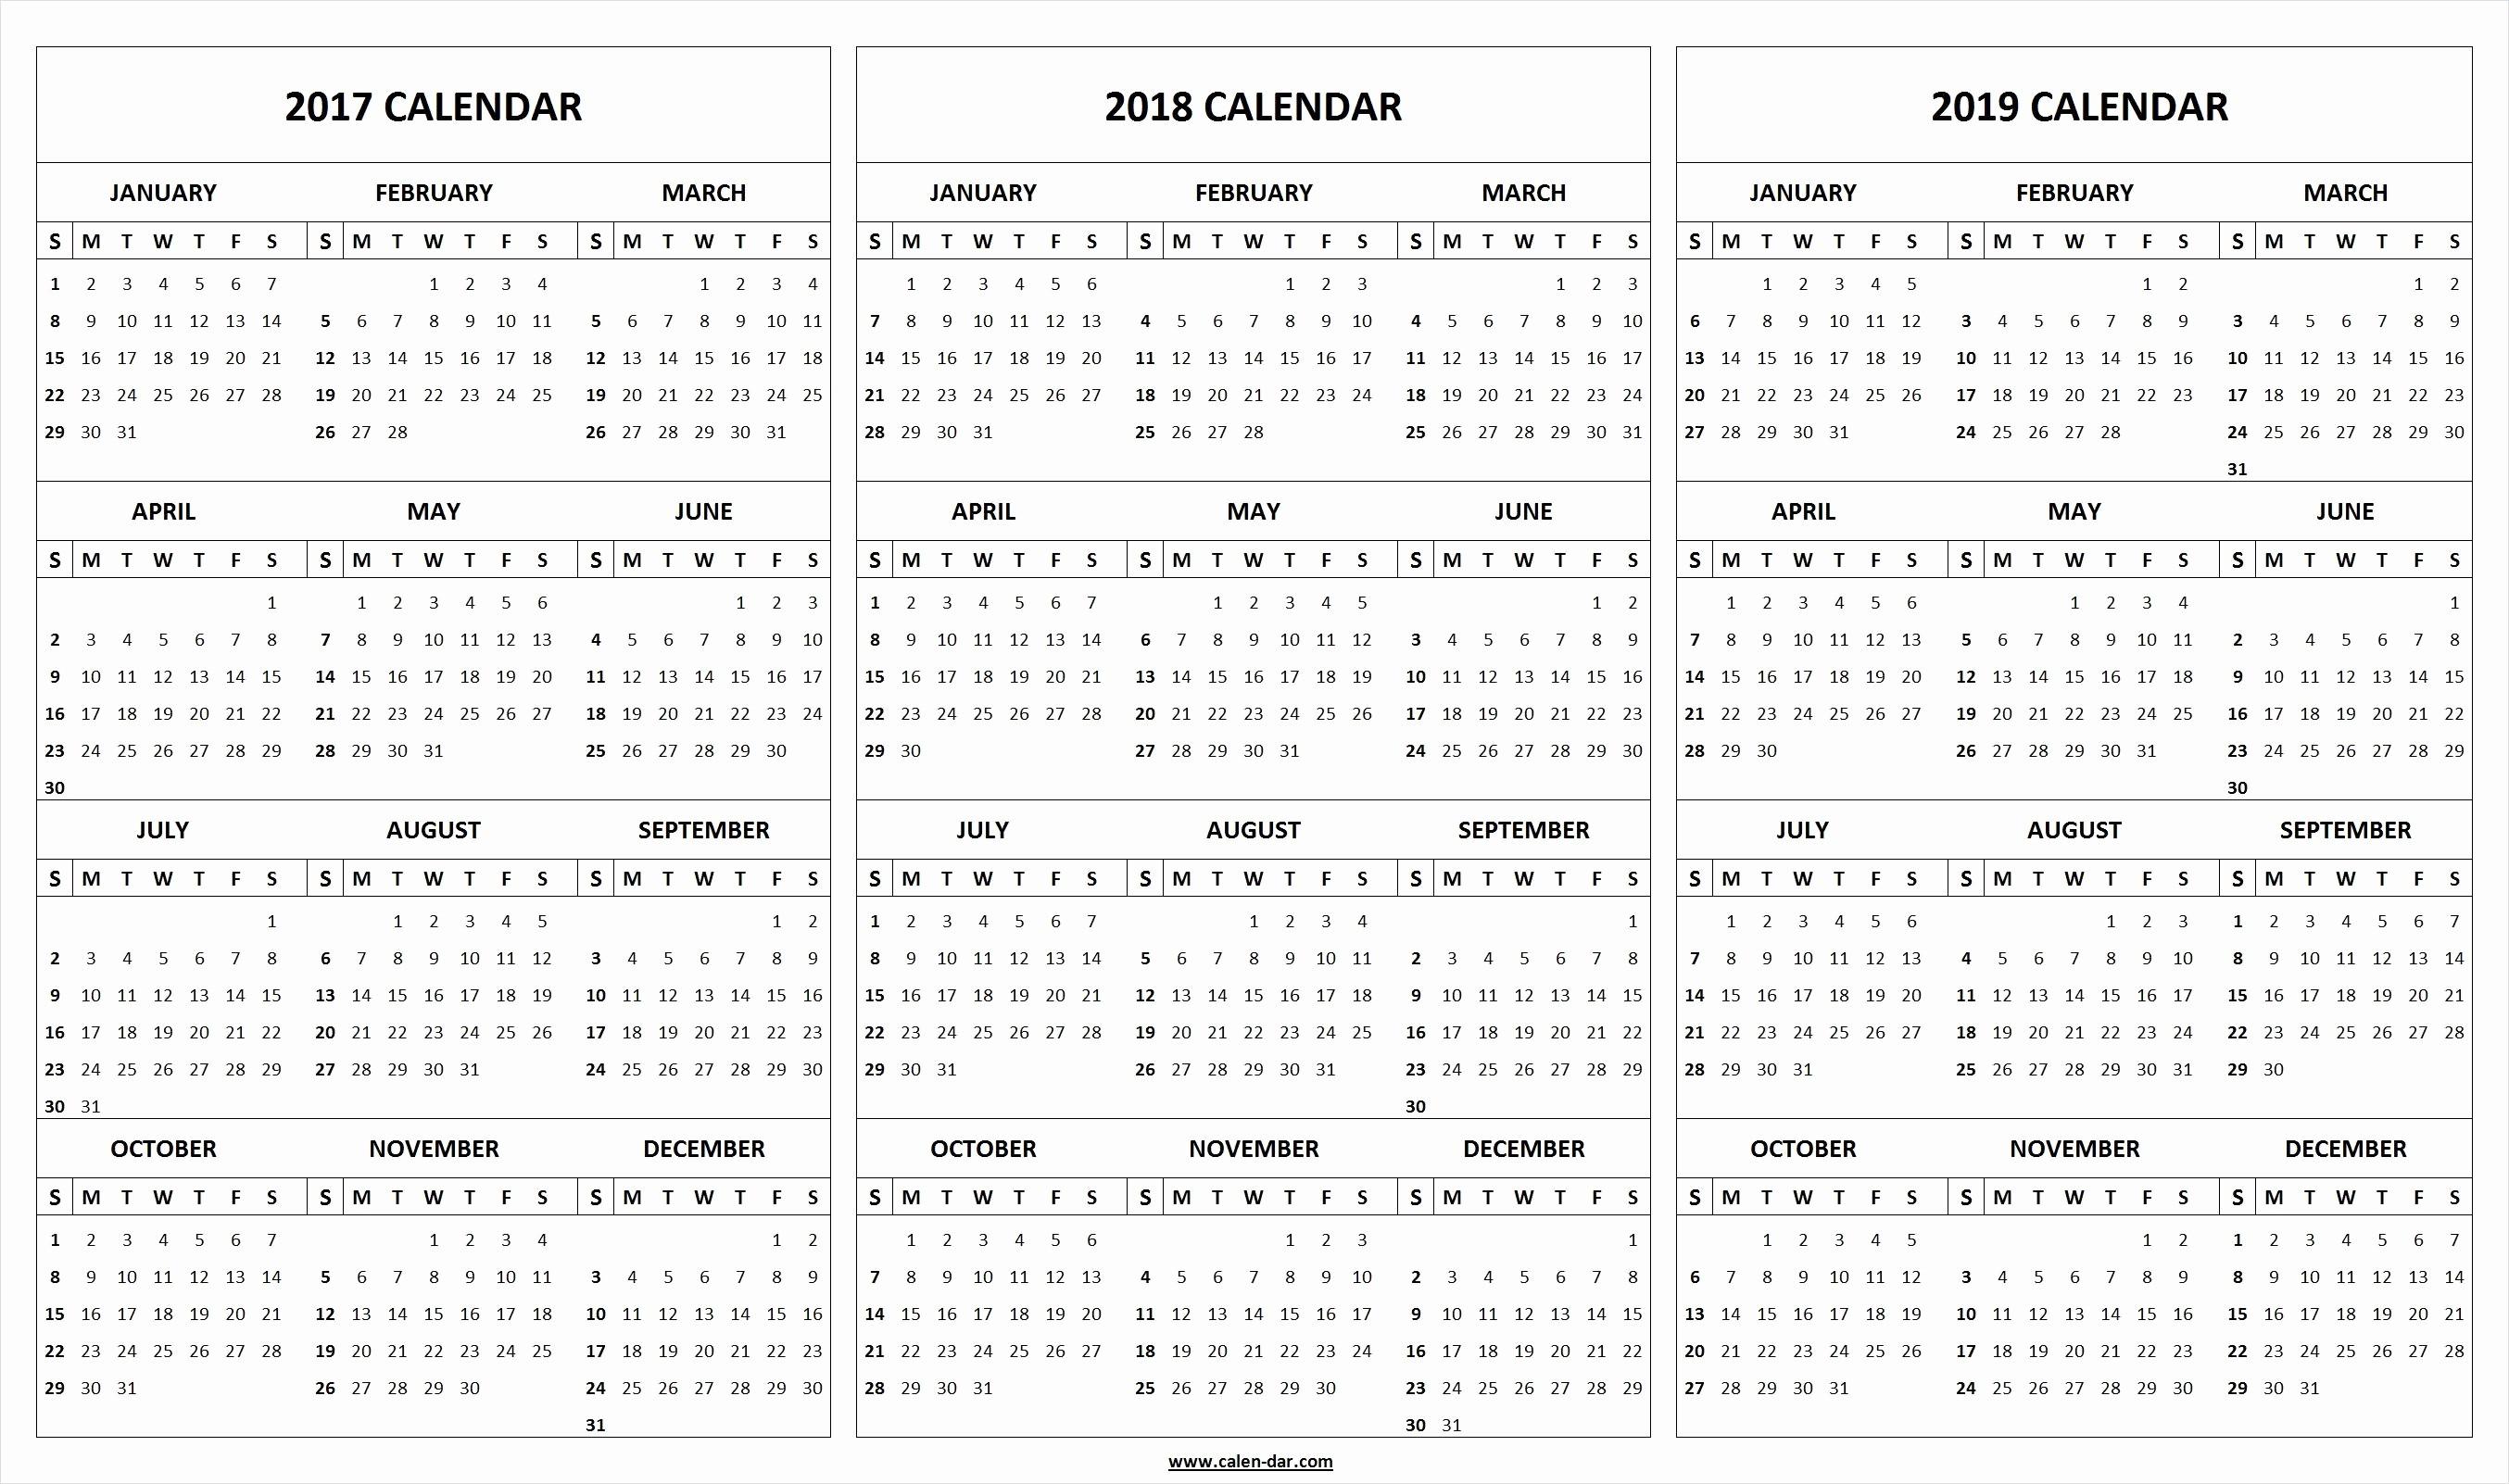 Printable 2018 and 2019 Calendar Beautiful Get Free Blank Printable 2017 2018 2019 Calendar Template